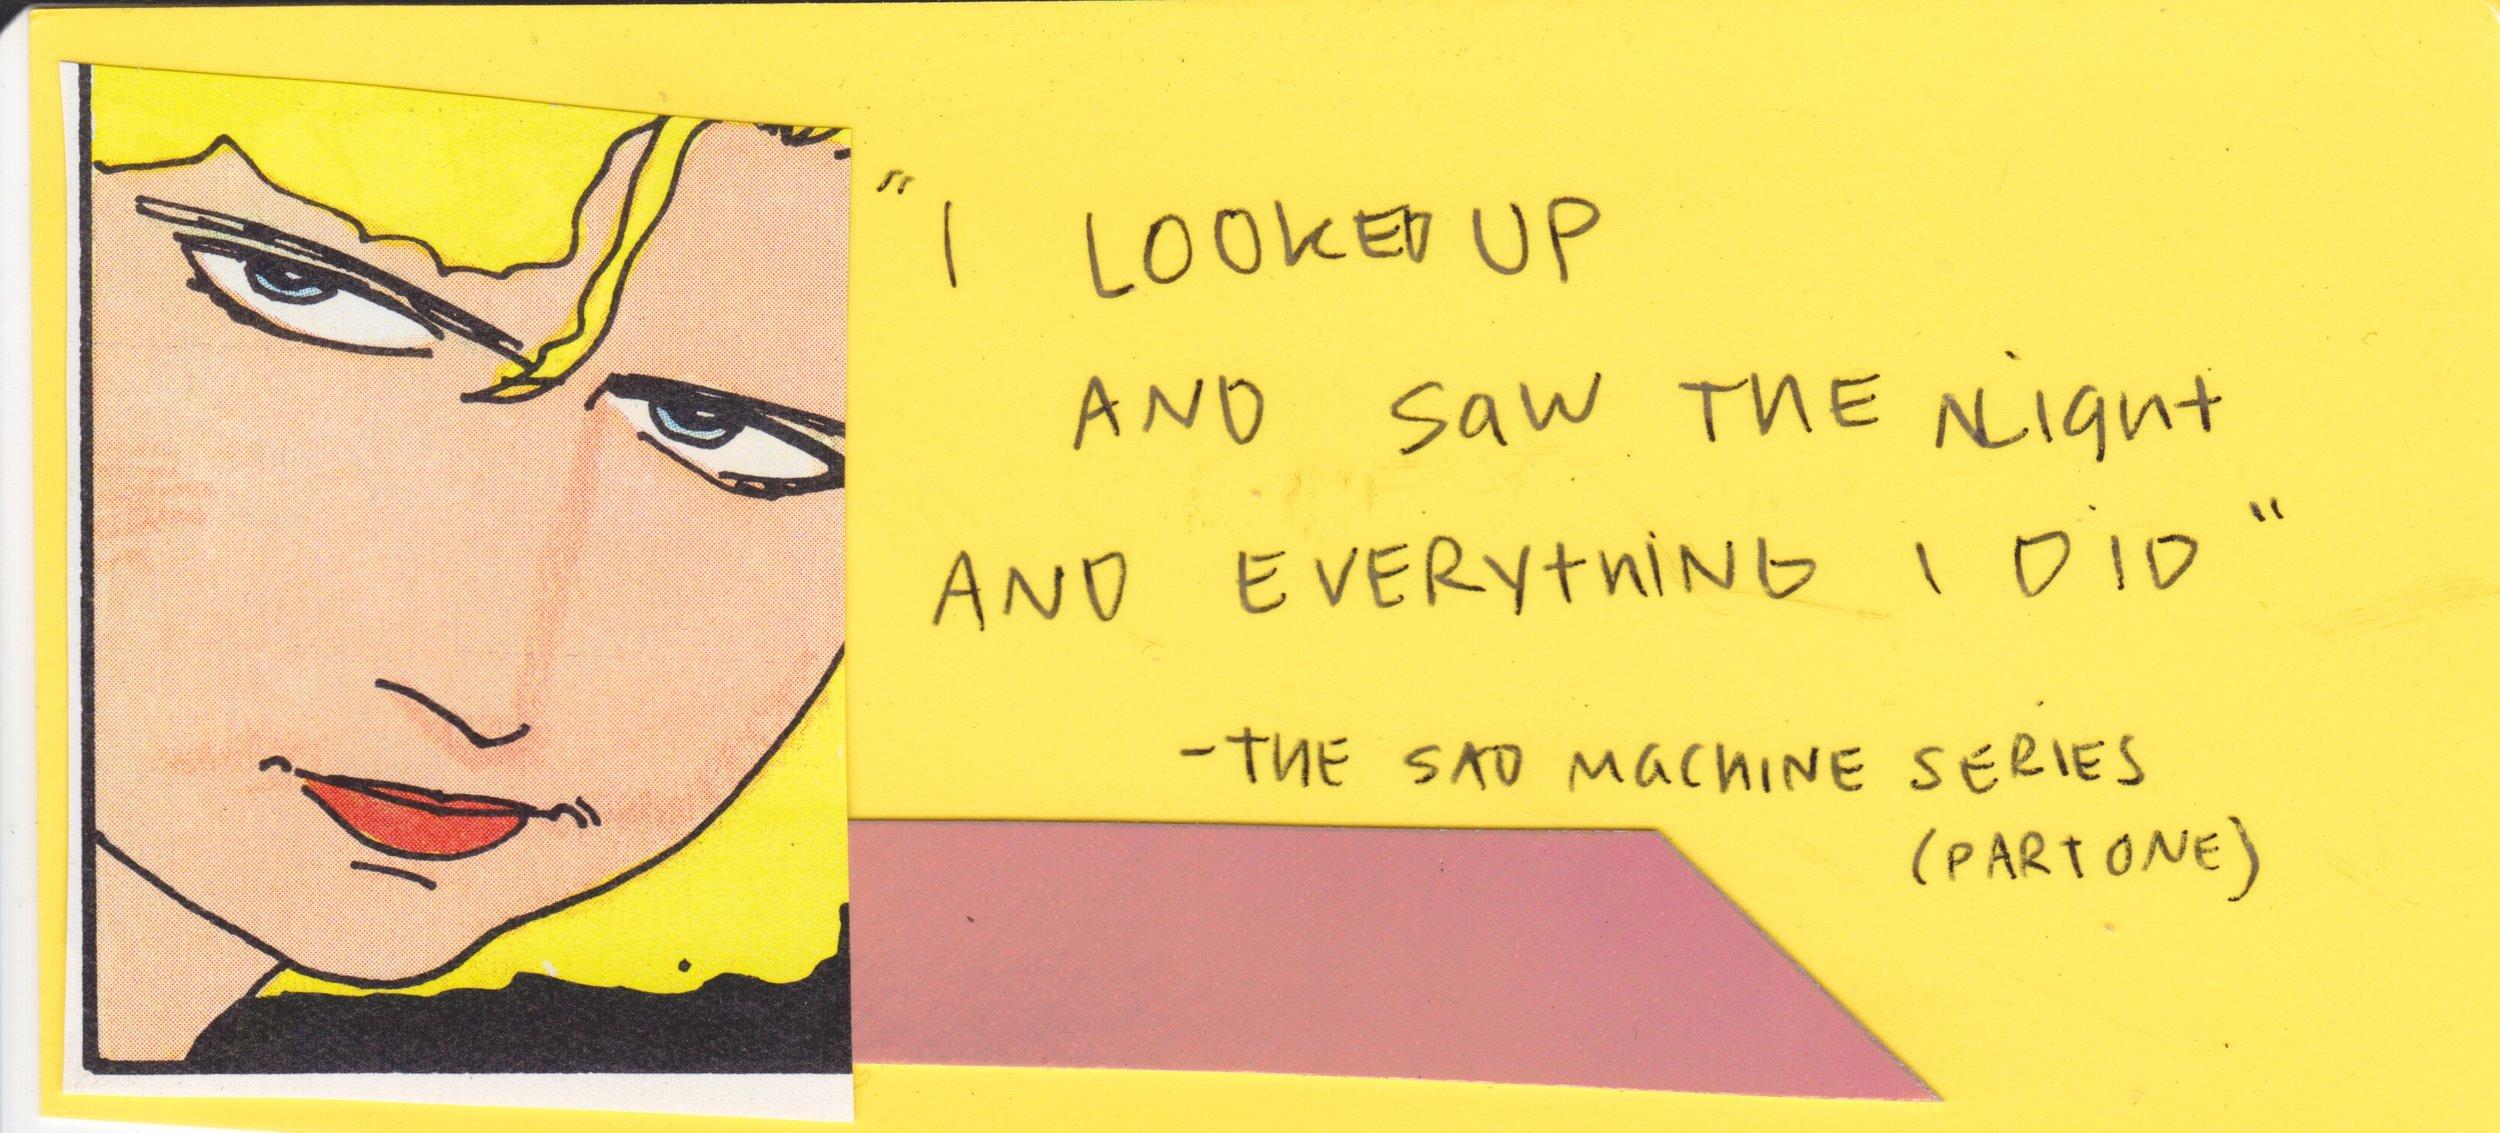 Sad Machine Series Quotes 8.jpeg